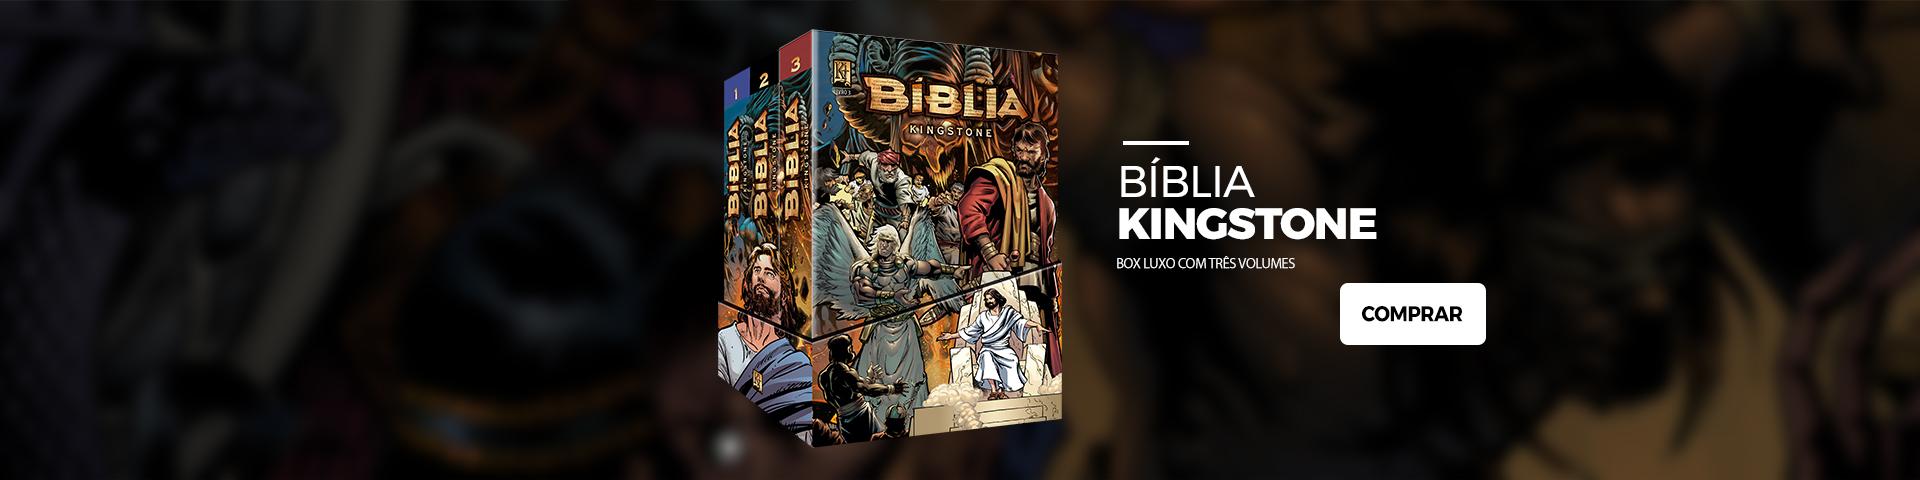 biblia_kingstone